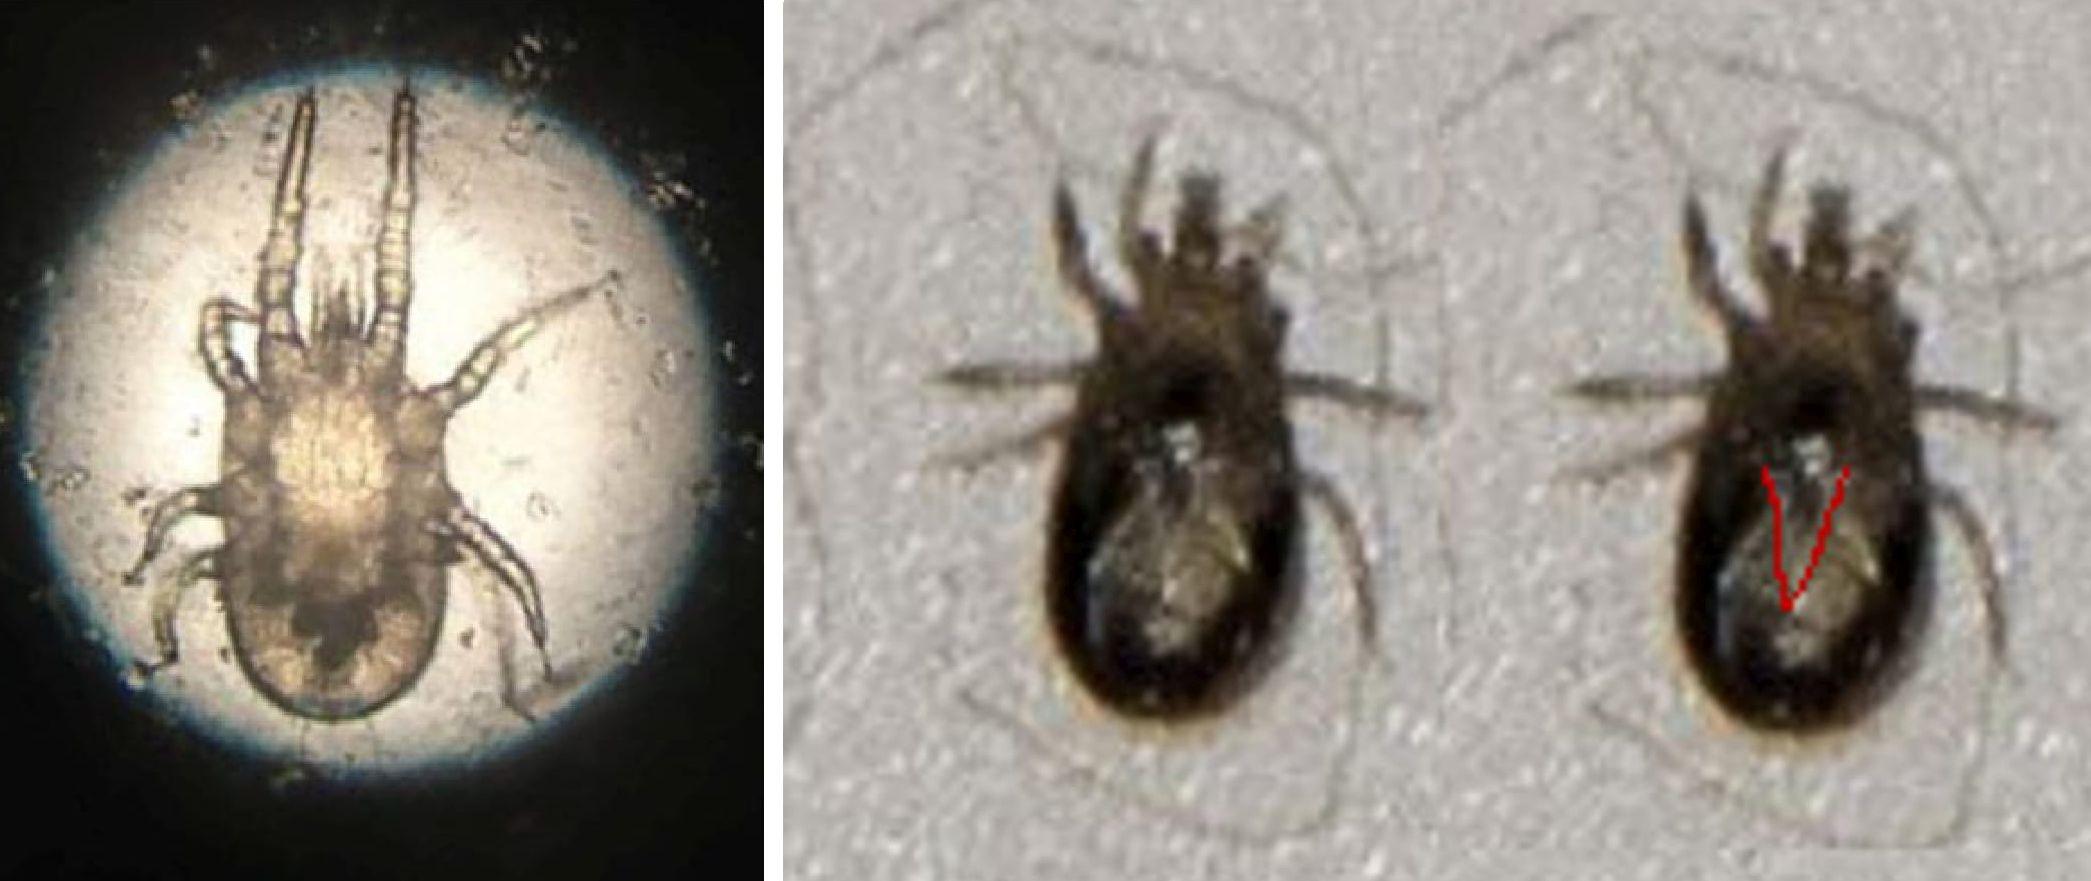 Mesostigmata Macronyssidae: Dermanyssus gallinae